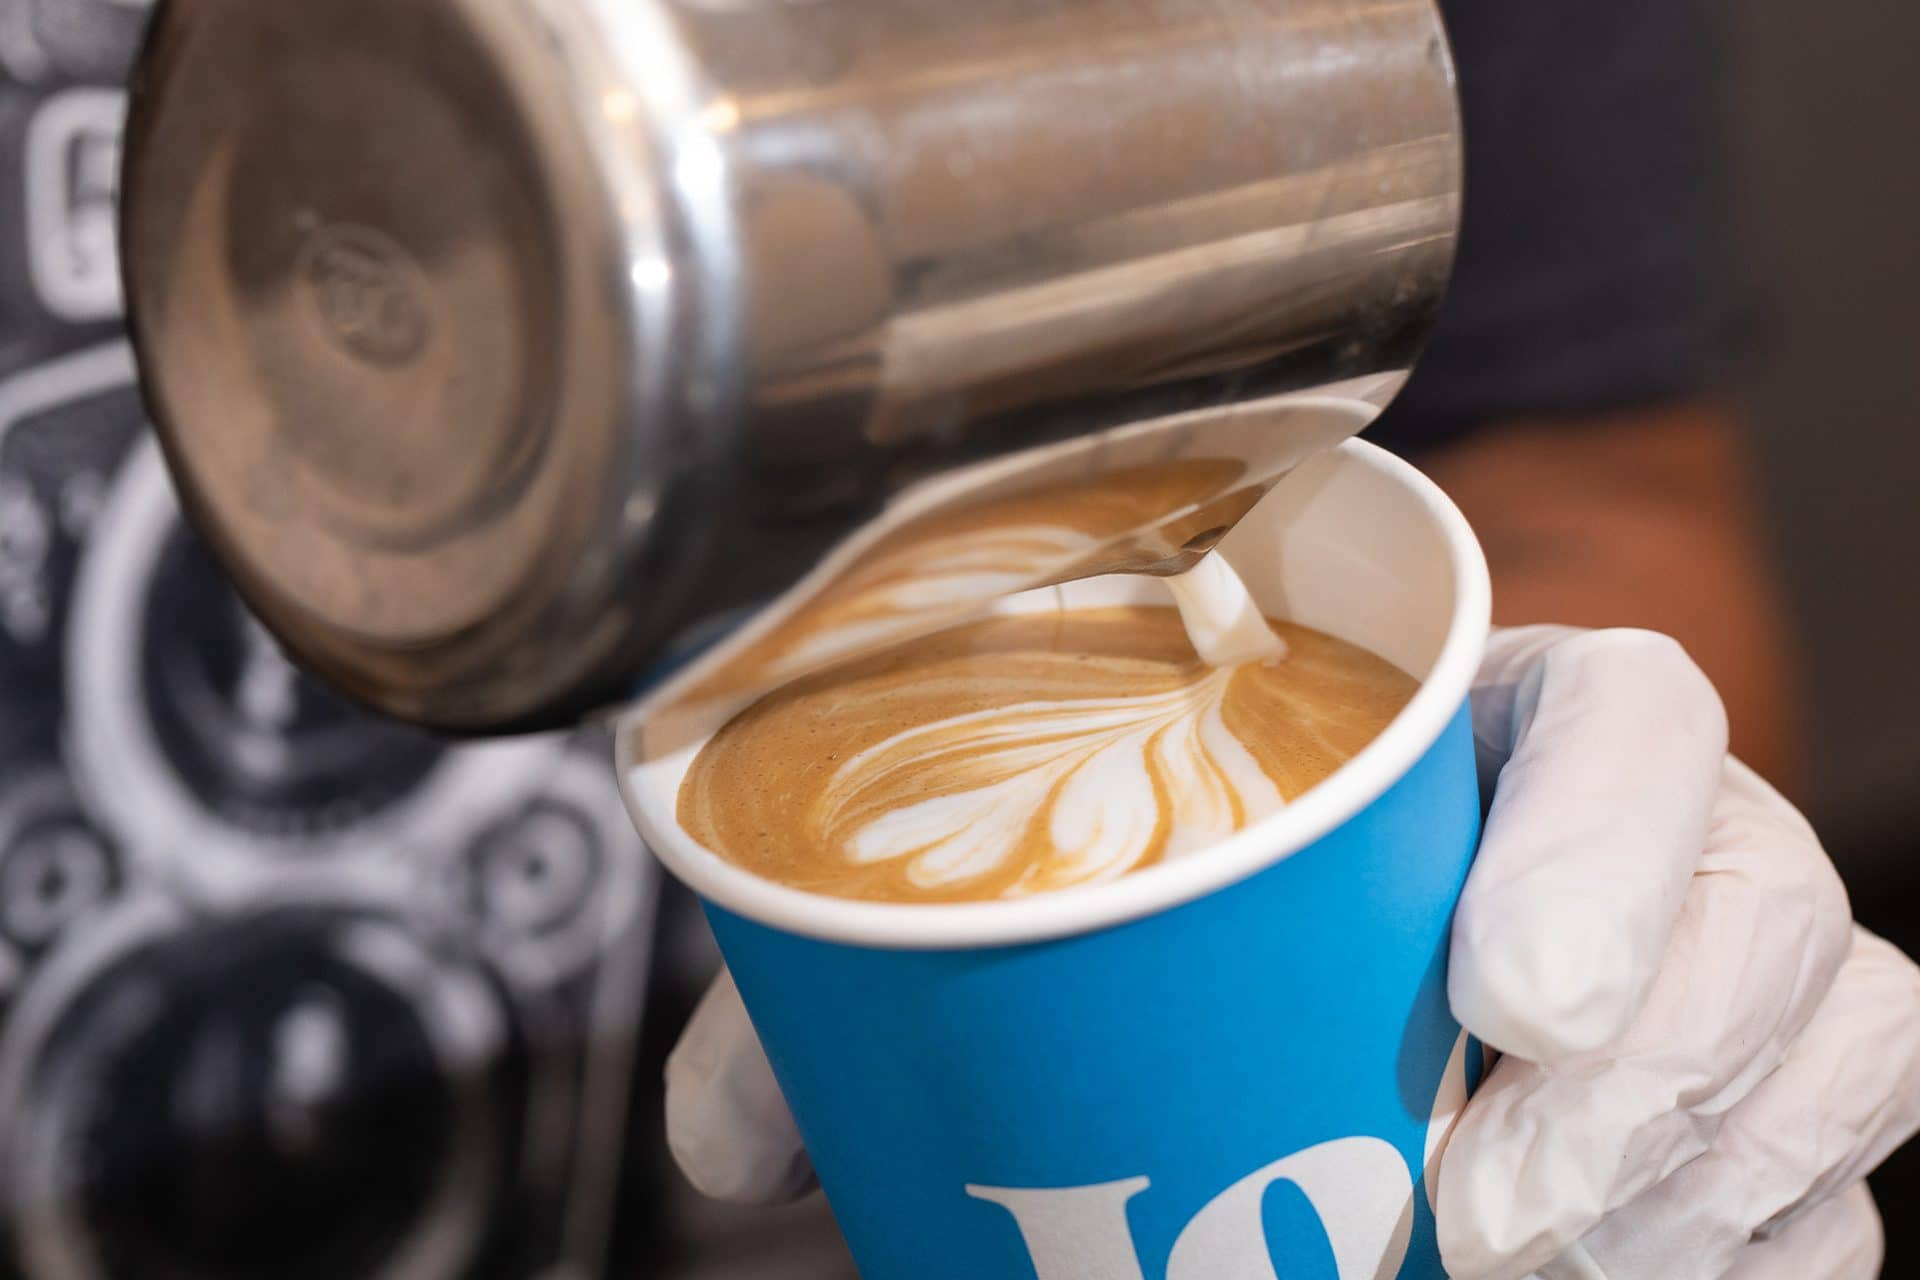 Pouring latte art into a Joe Coffee cup